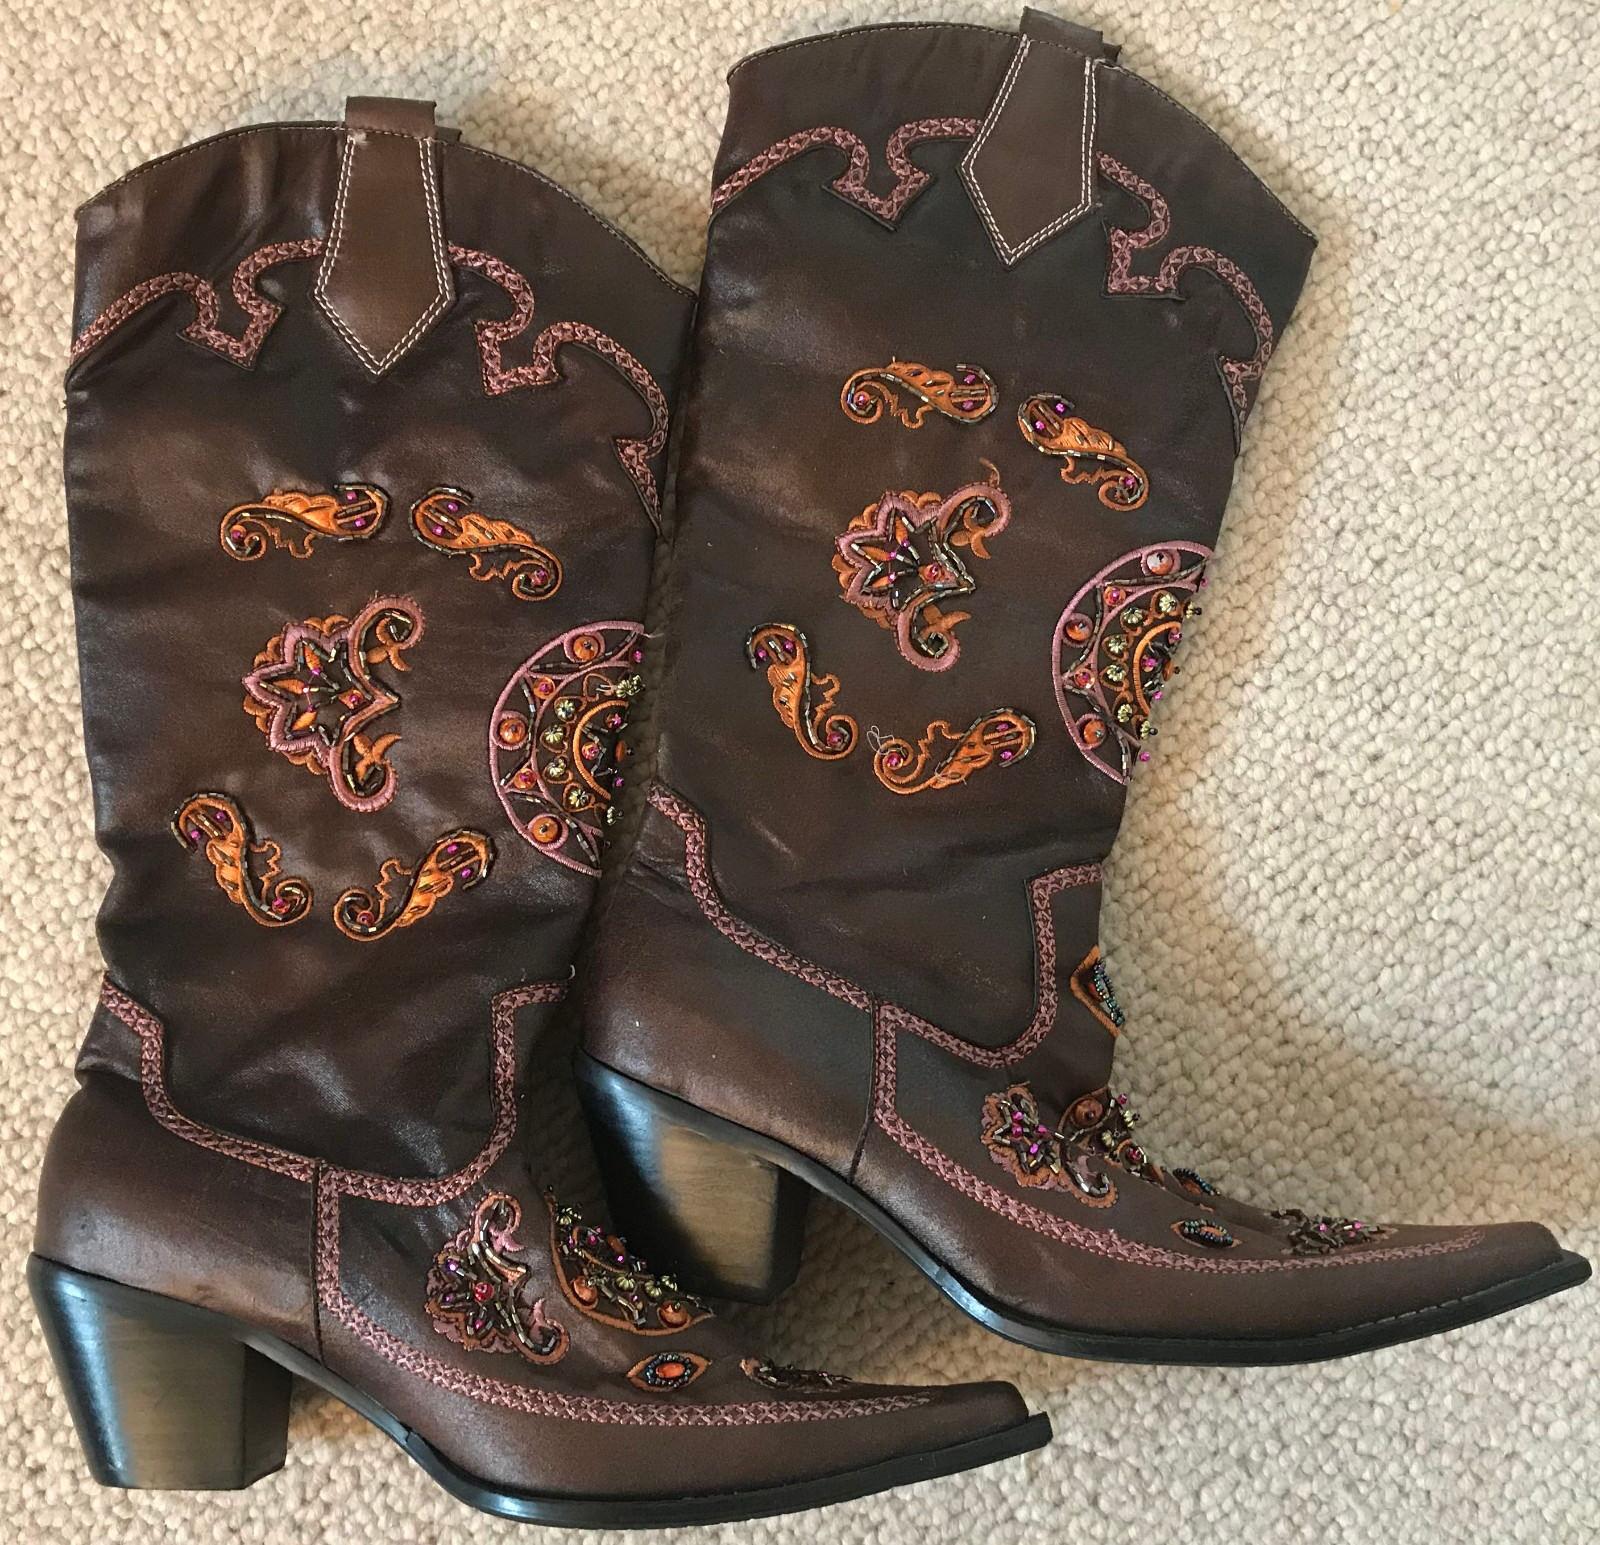 Westernstiefel Cowboystiefel Stiefel Gr 40 Lila-braun ca. 42cm hoch Strass CHIC